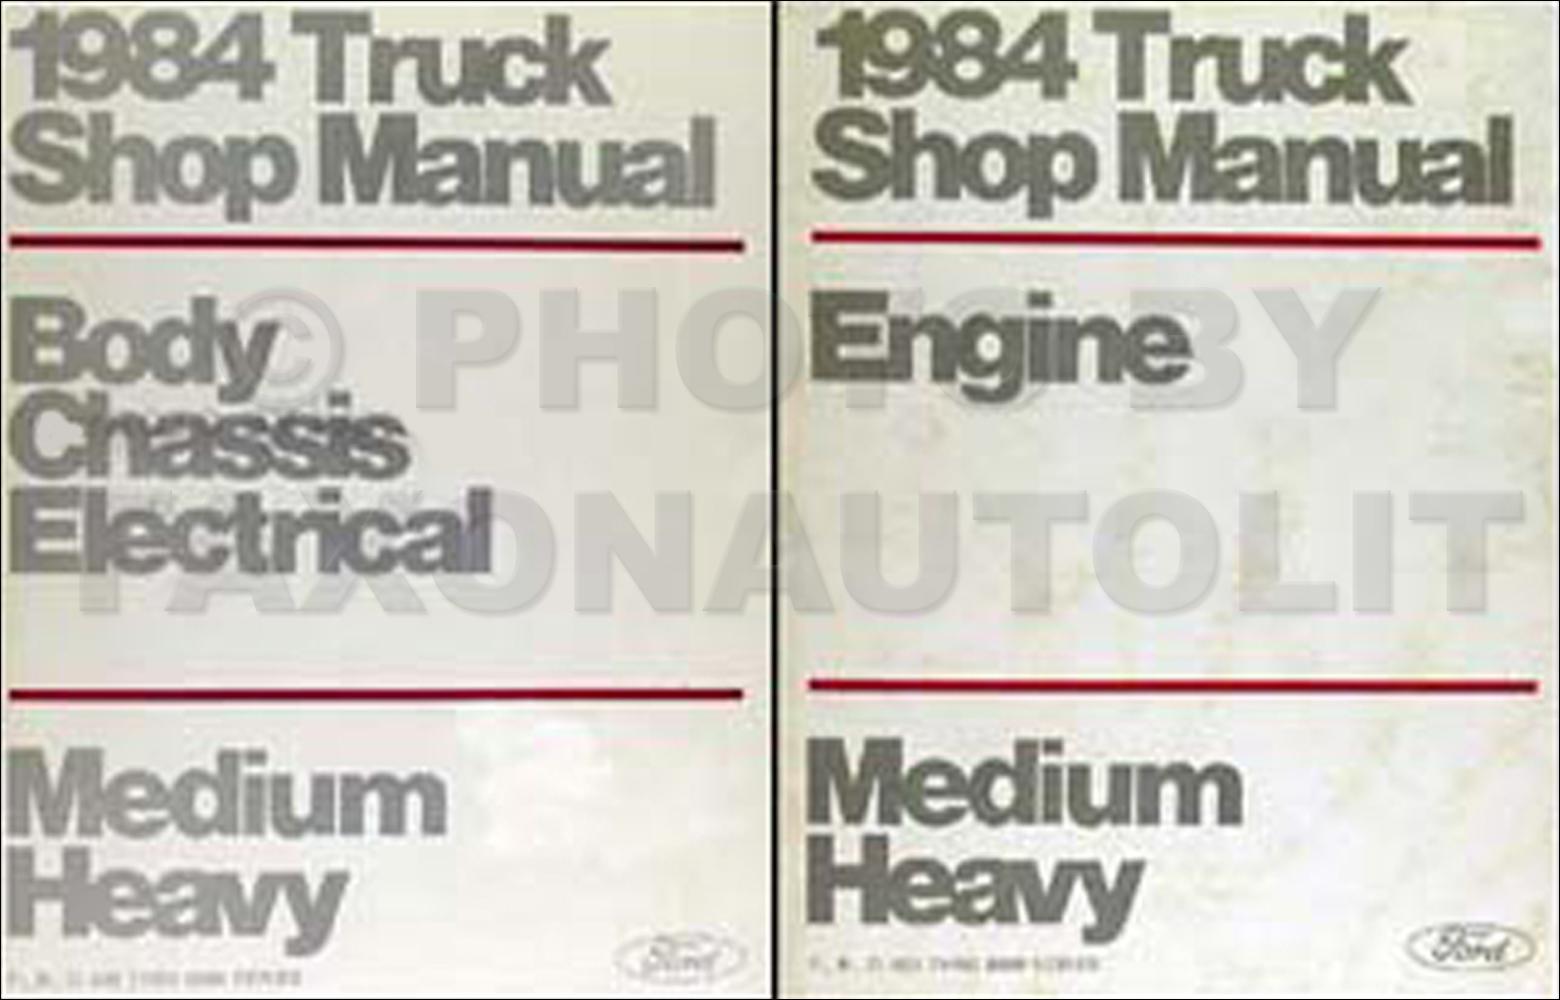 1984 Ford F B C 600-8000 Medium/Heavy Truck Repair Shop Manual Set Original